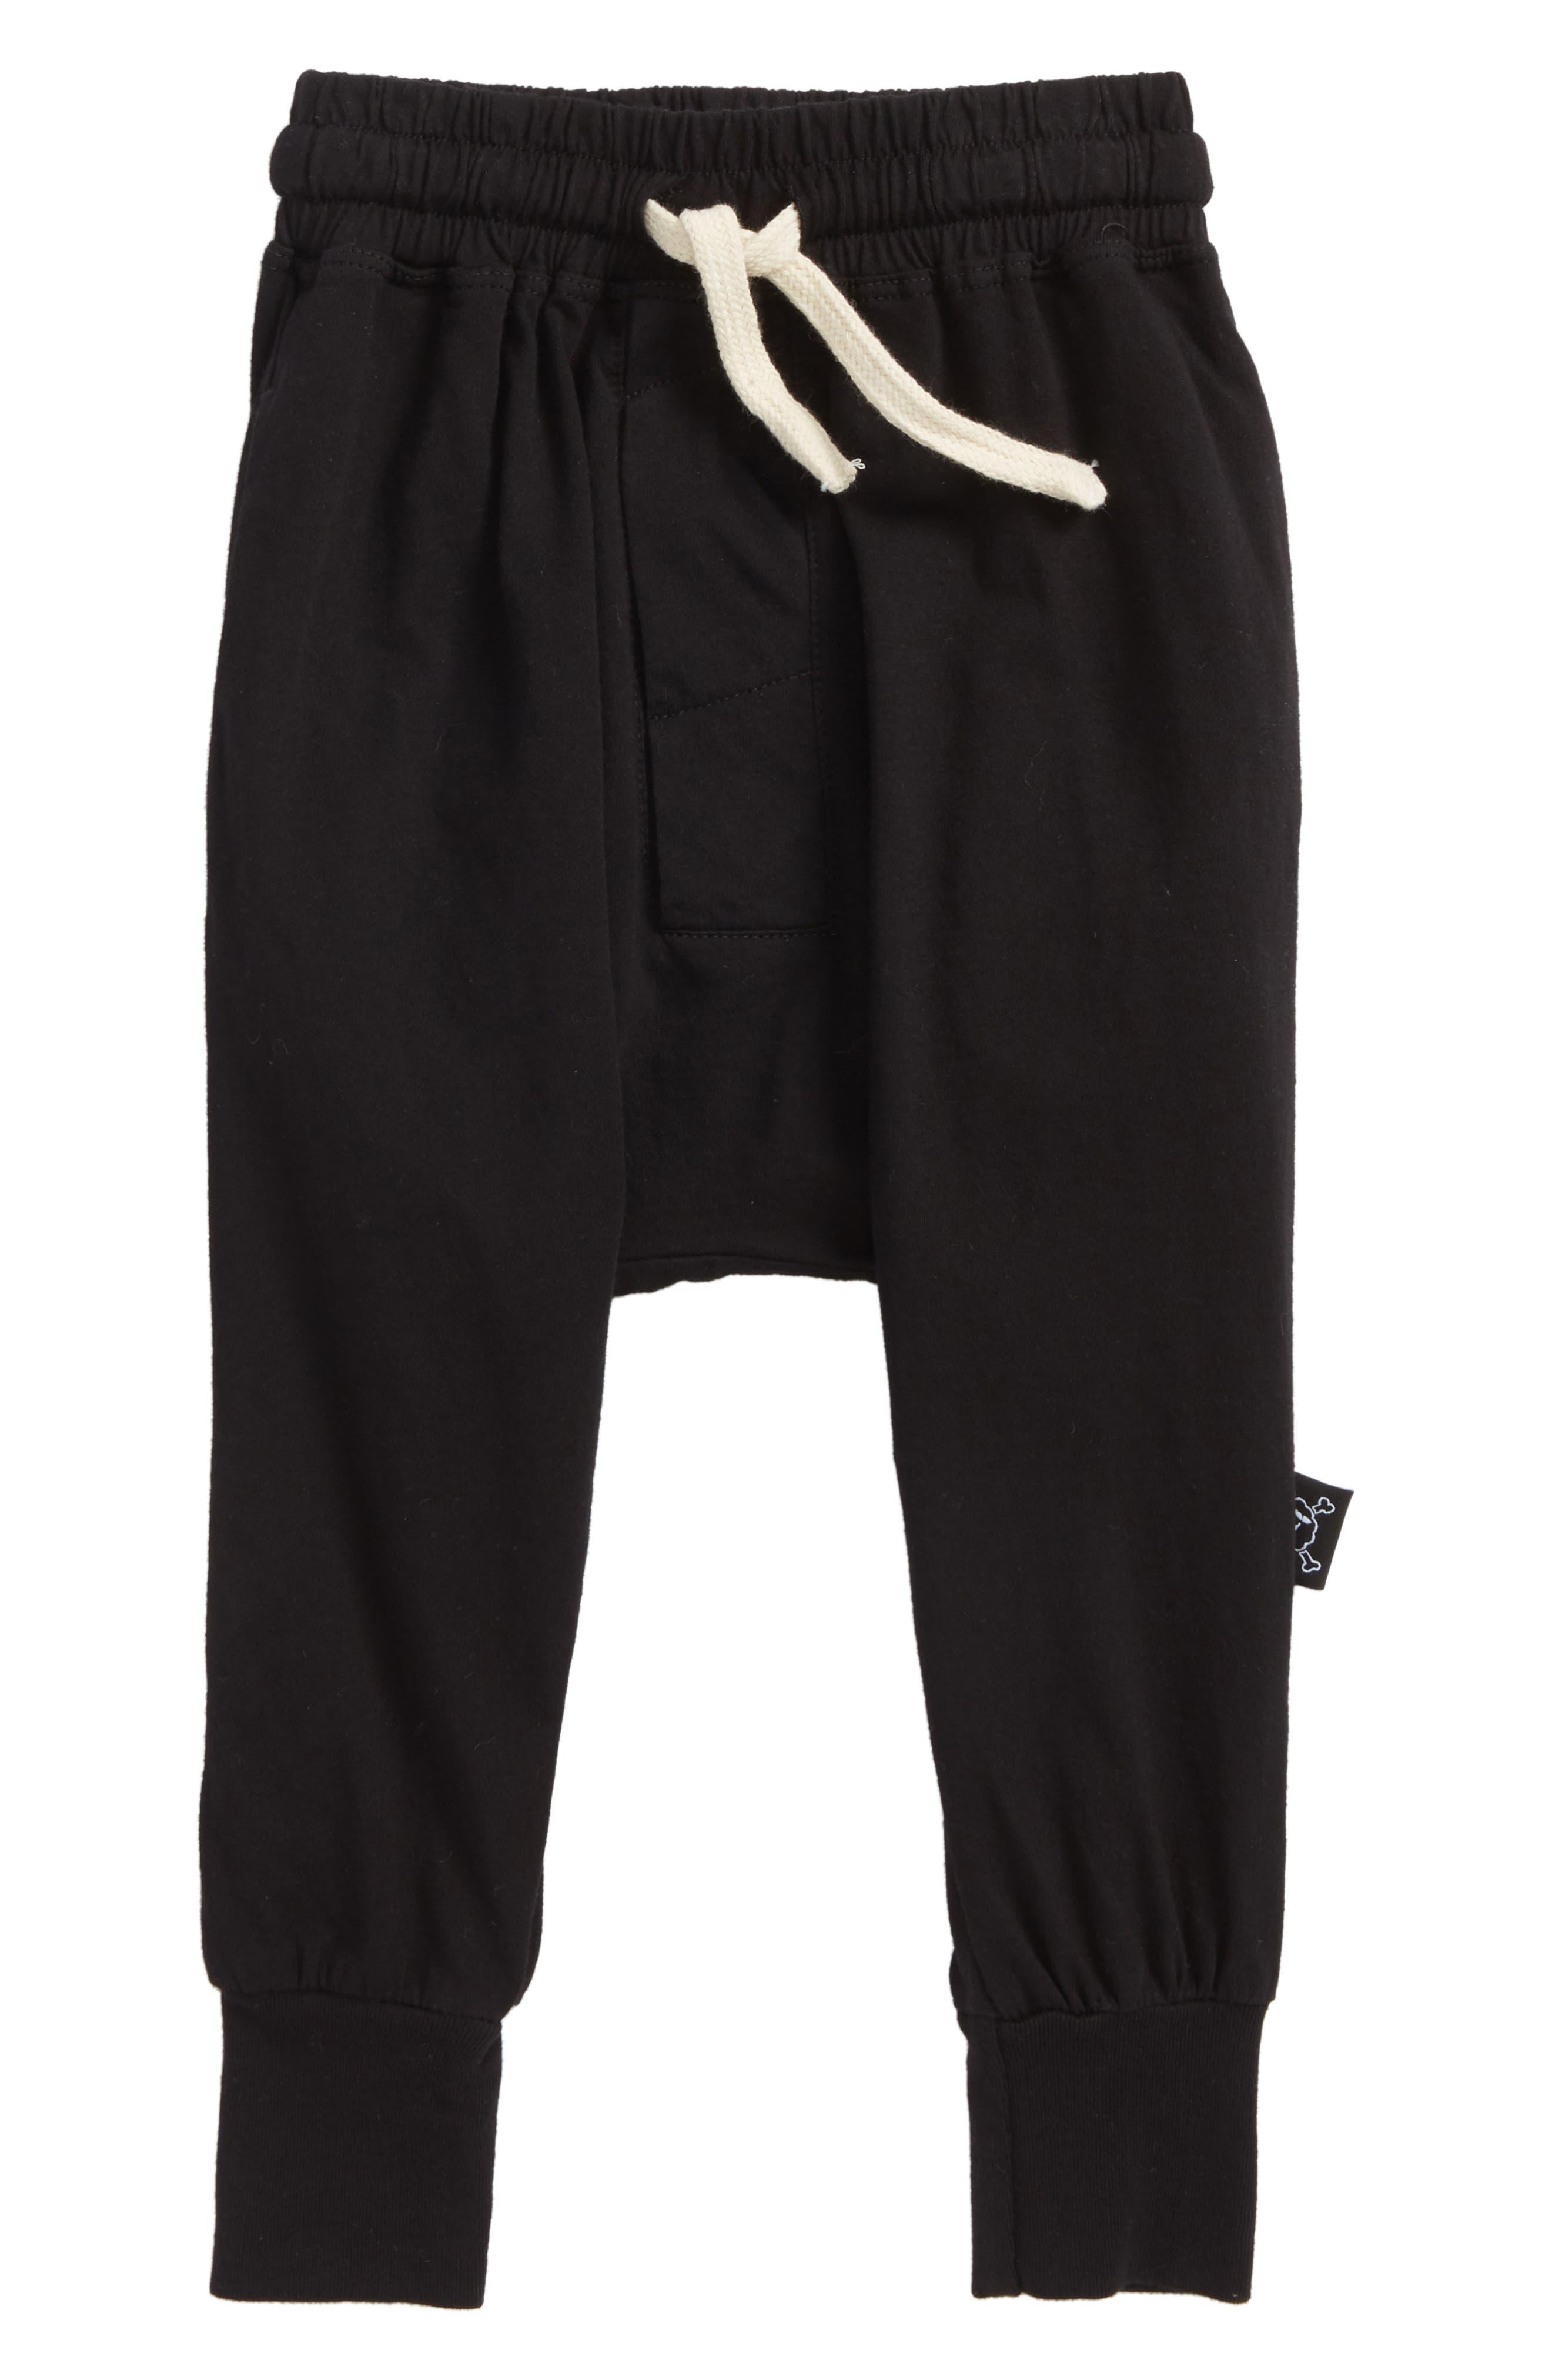 Jogger Pants,                             Main thumbnail 1, color,                             Black